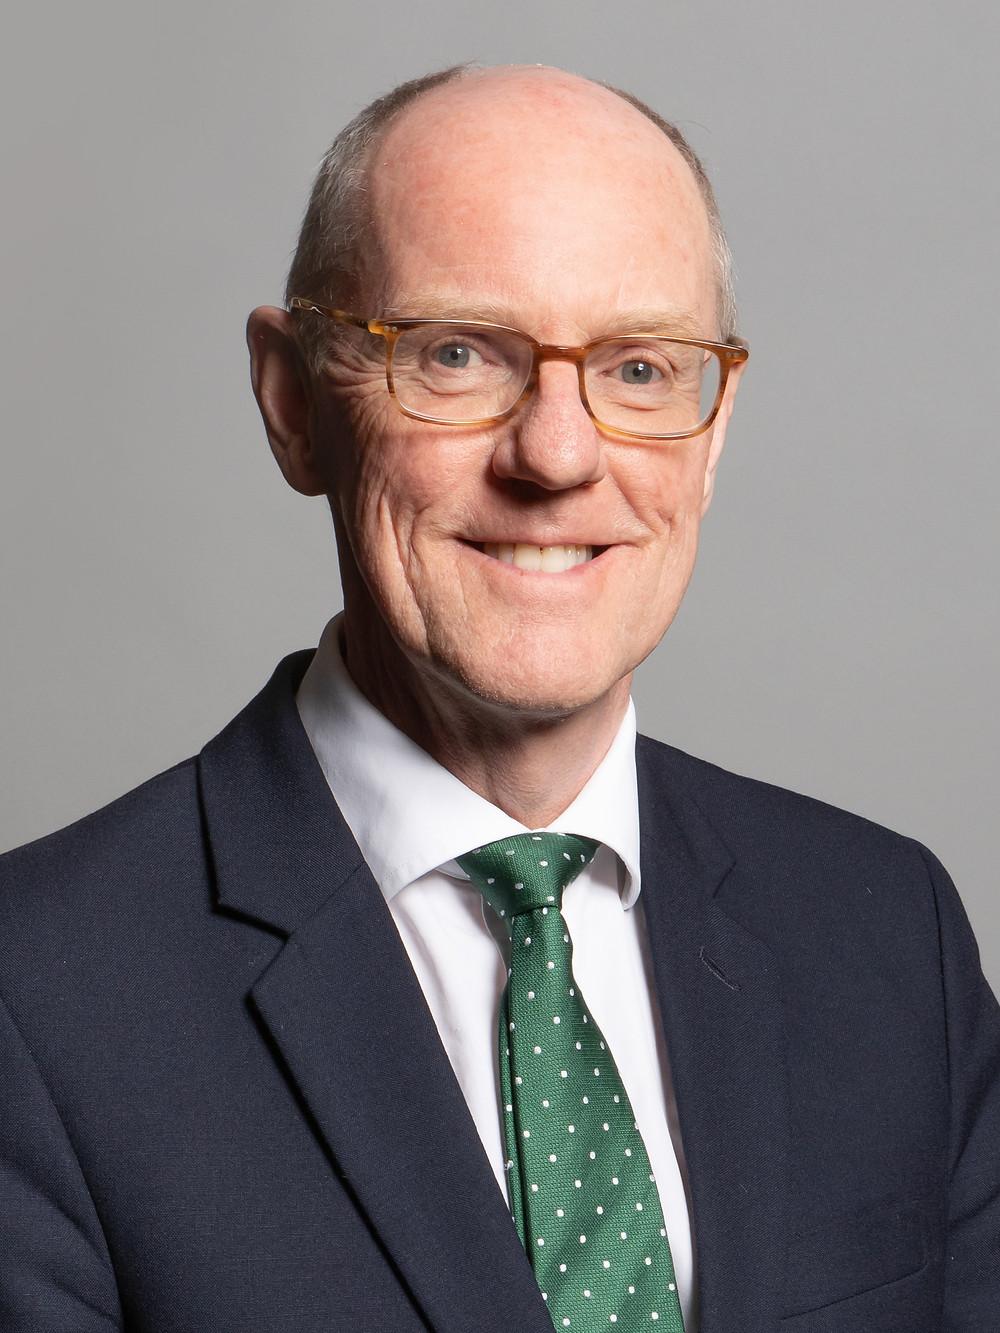 The Rt Hon Nick Gibb MP